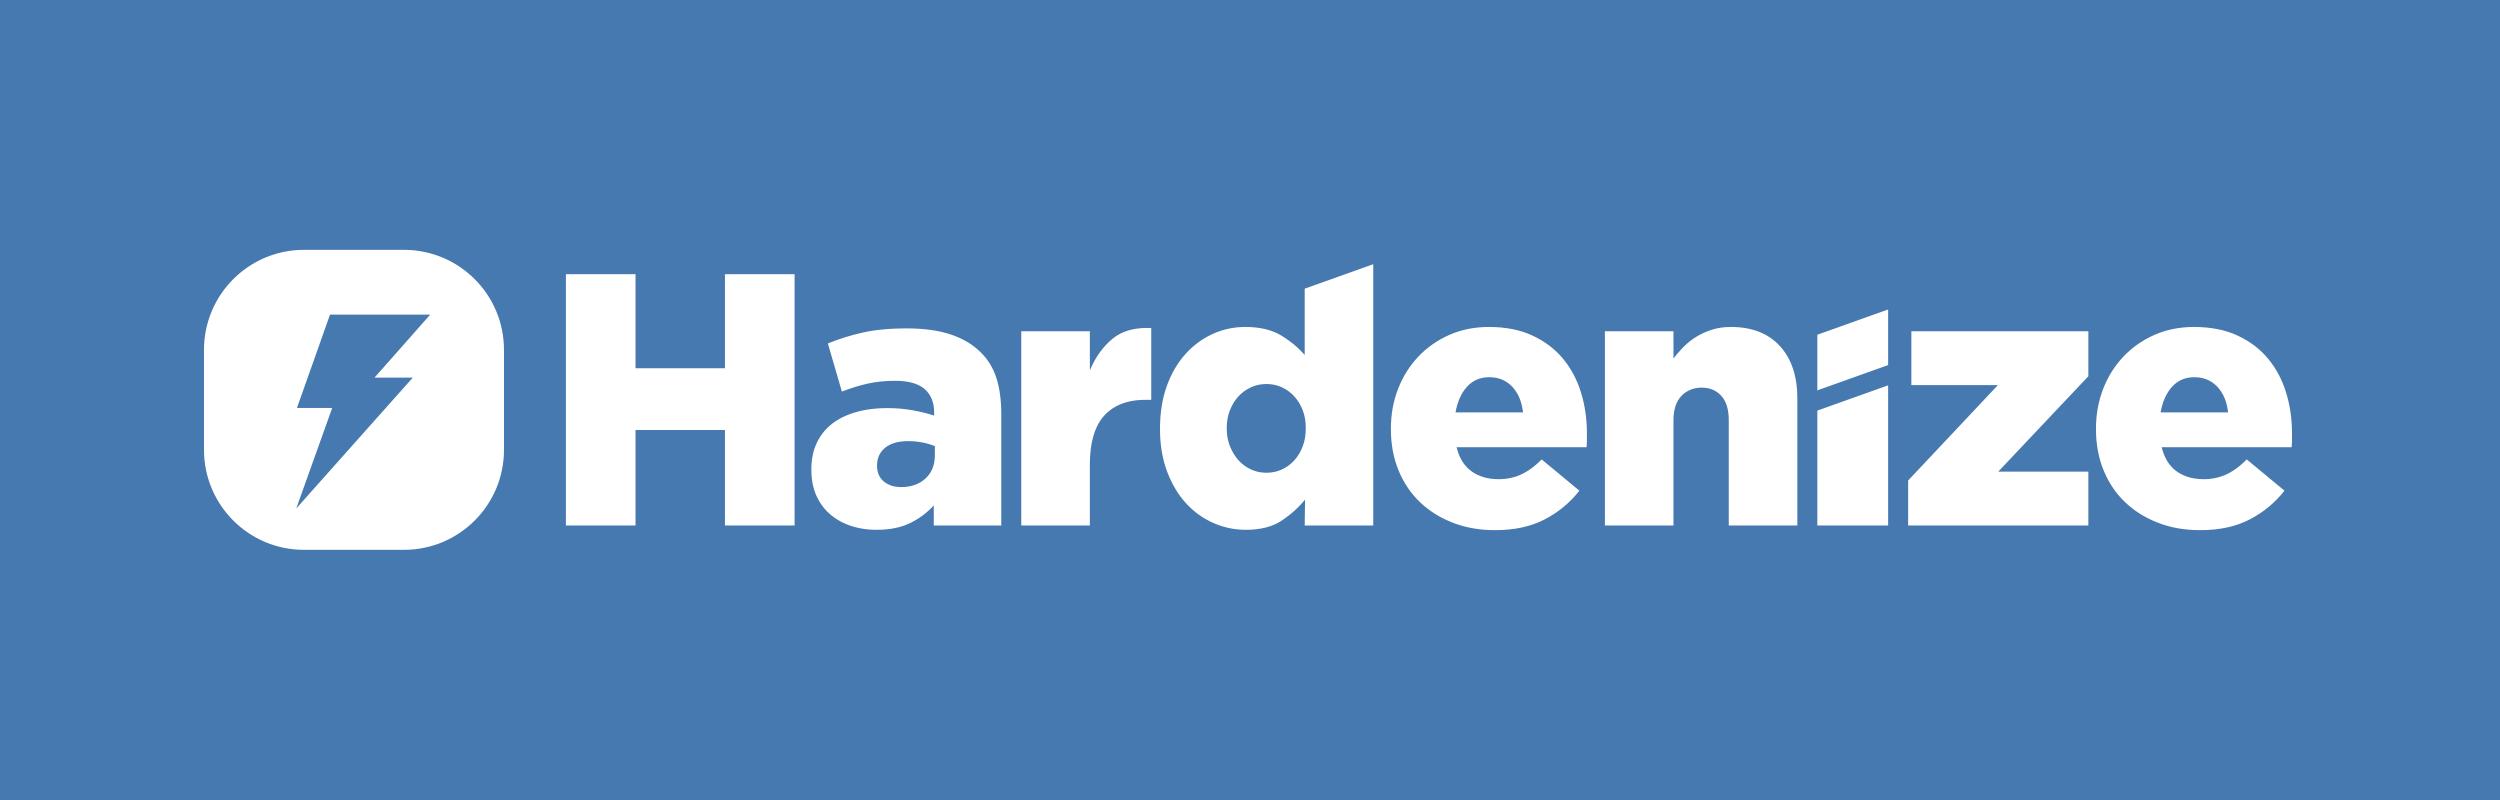 Hardenize Org API v1 043 0 – Hardenize Org API